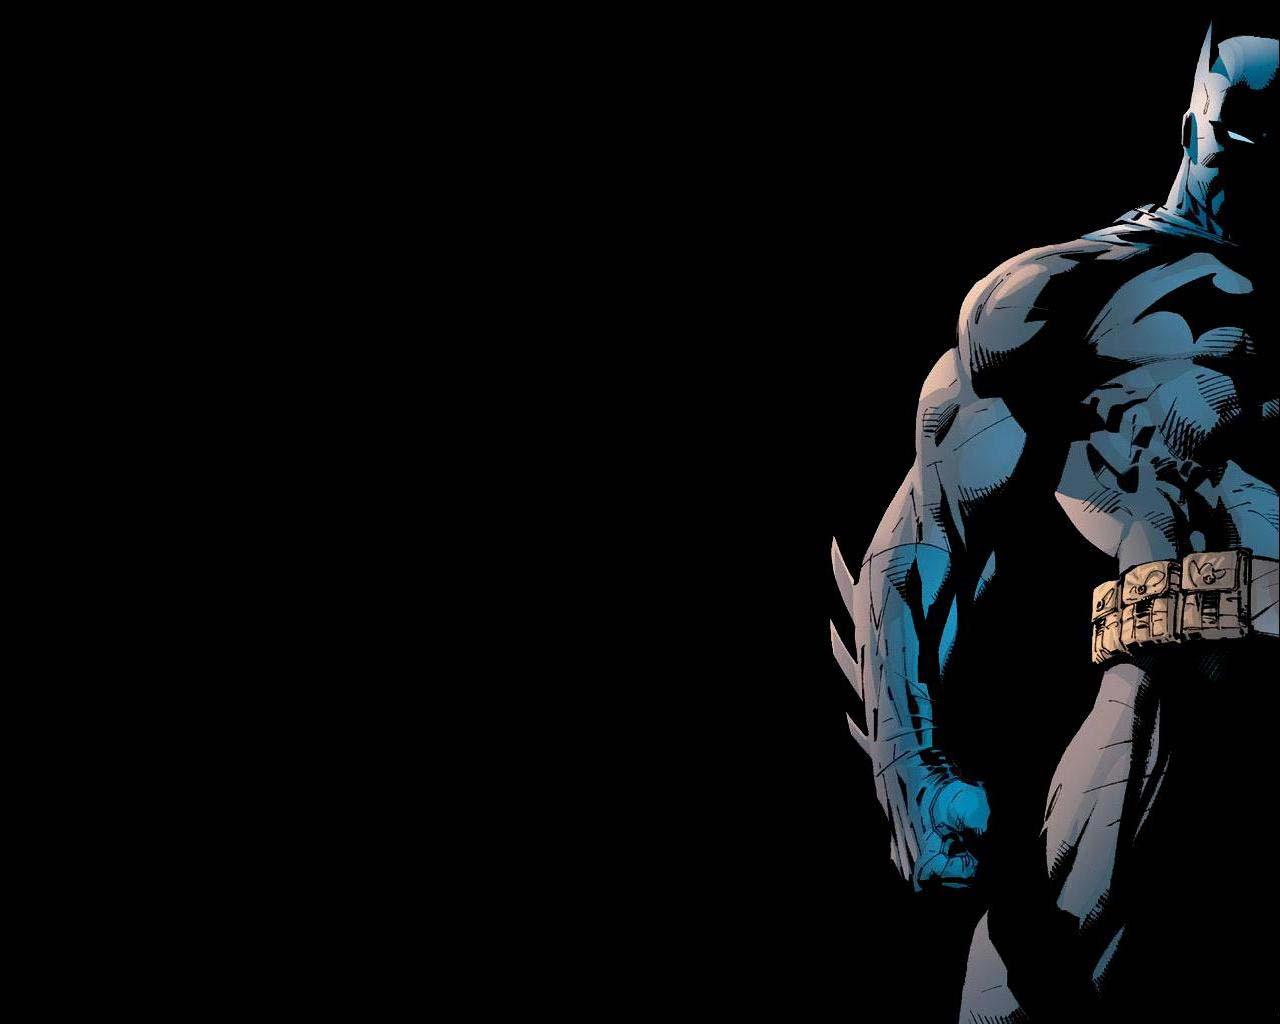 Dark Black Batman Wallpaper   Cartoon Watcher   Batman 1280x1024